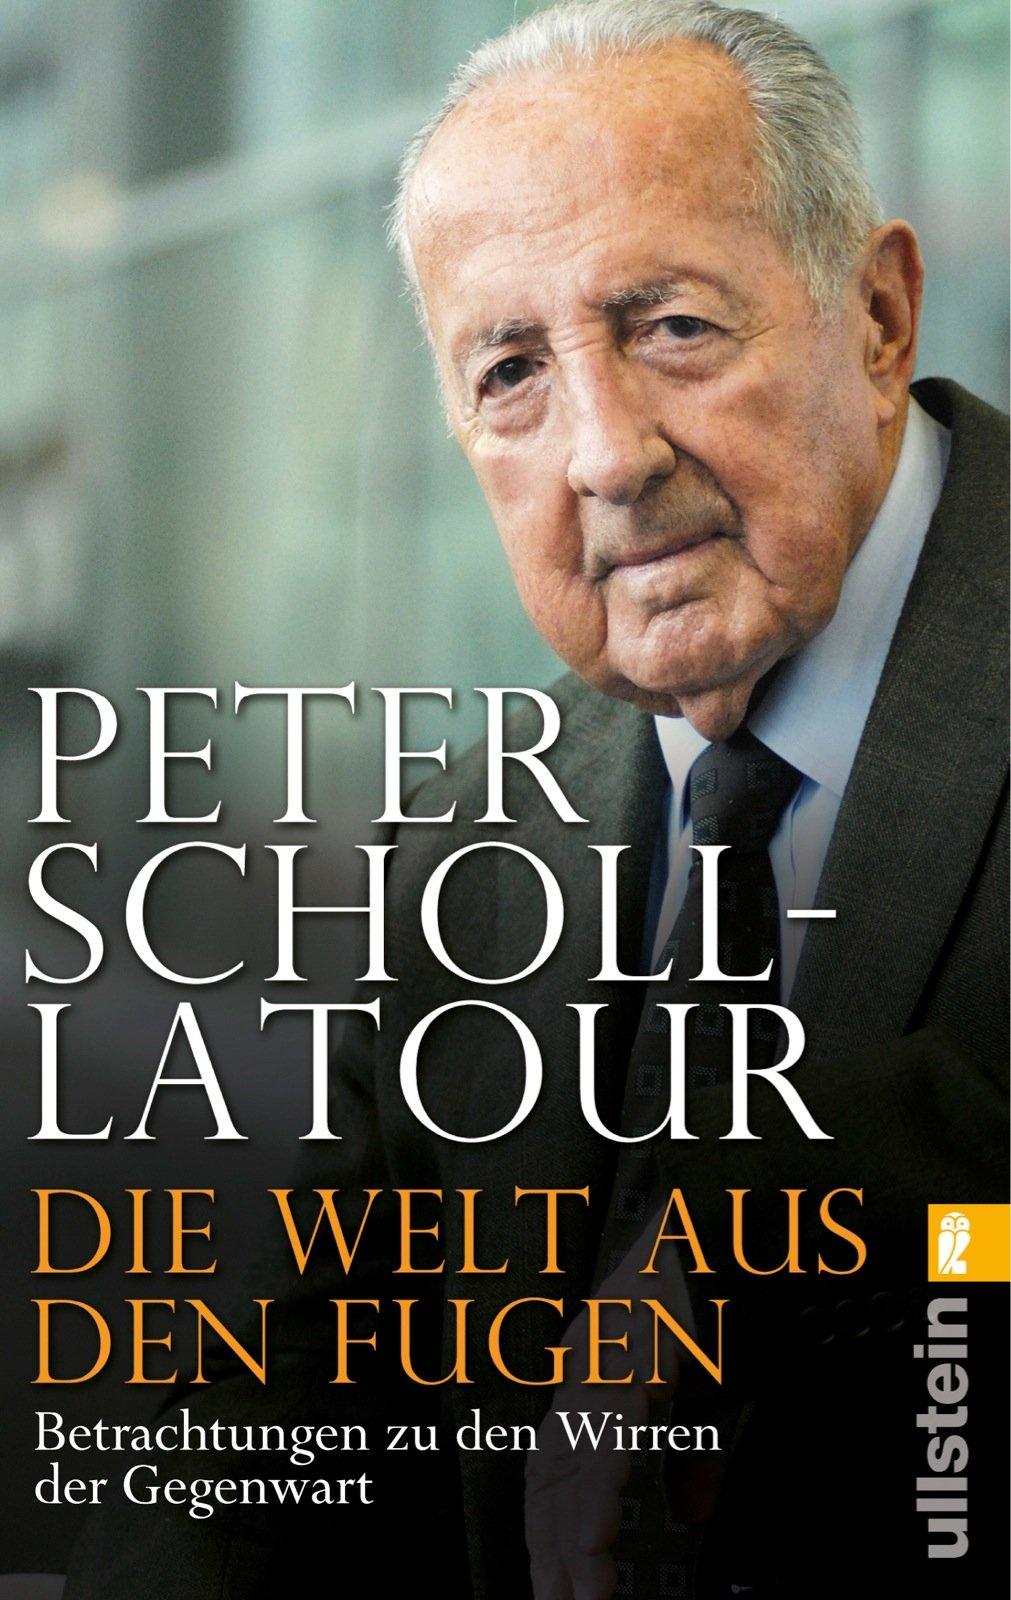 """R.I.P. Peter Scholl-Latour"""